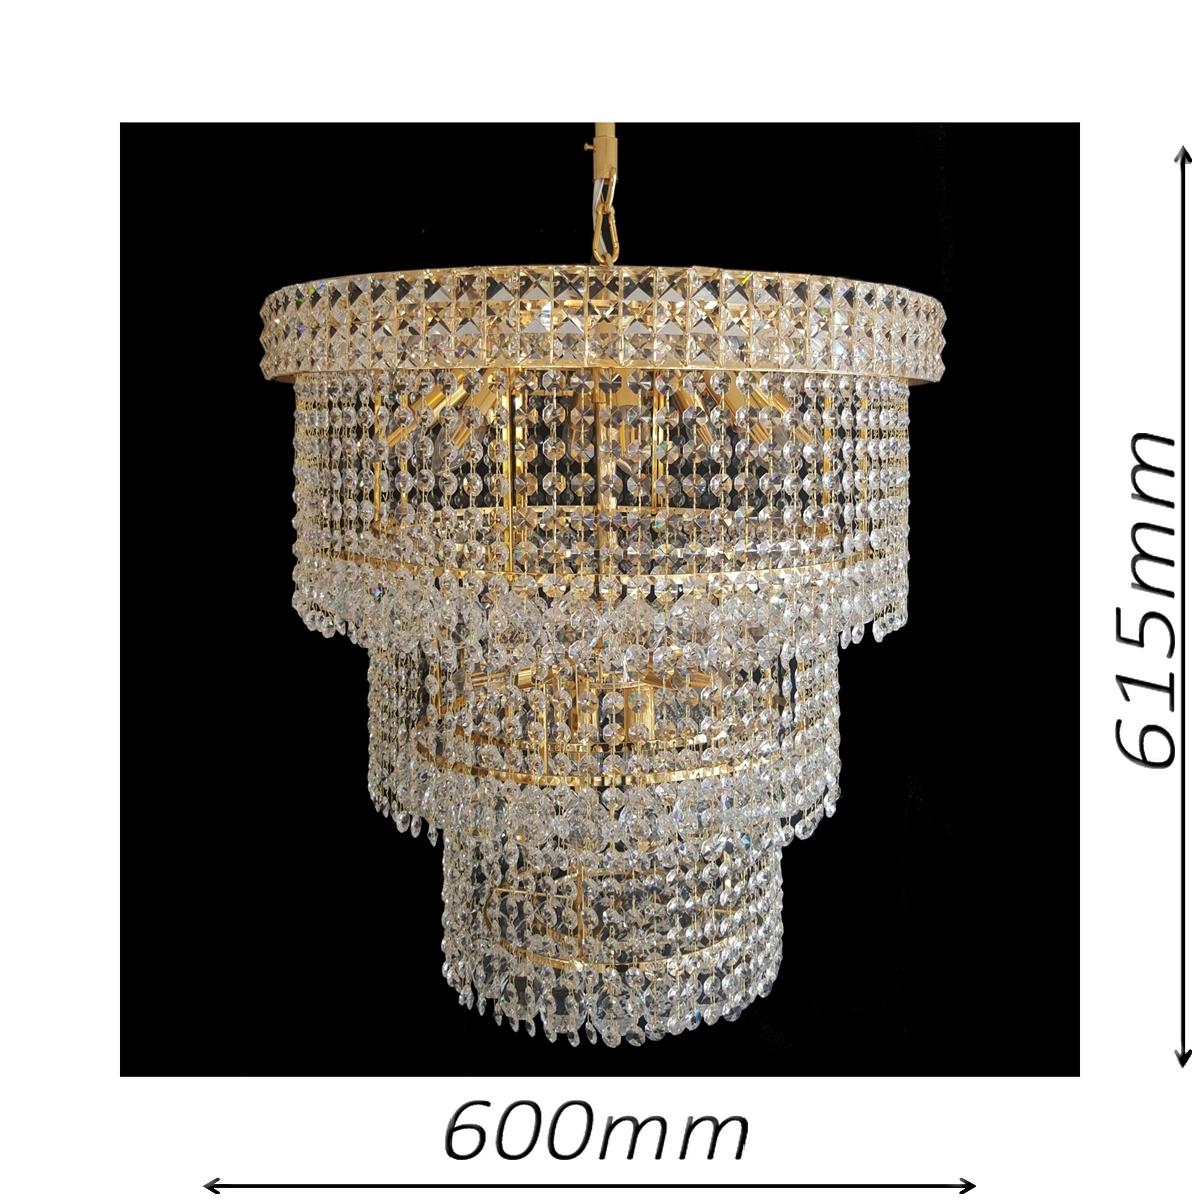 Lincoln 600 Gold Chandelier - CRPLIN14600GD